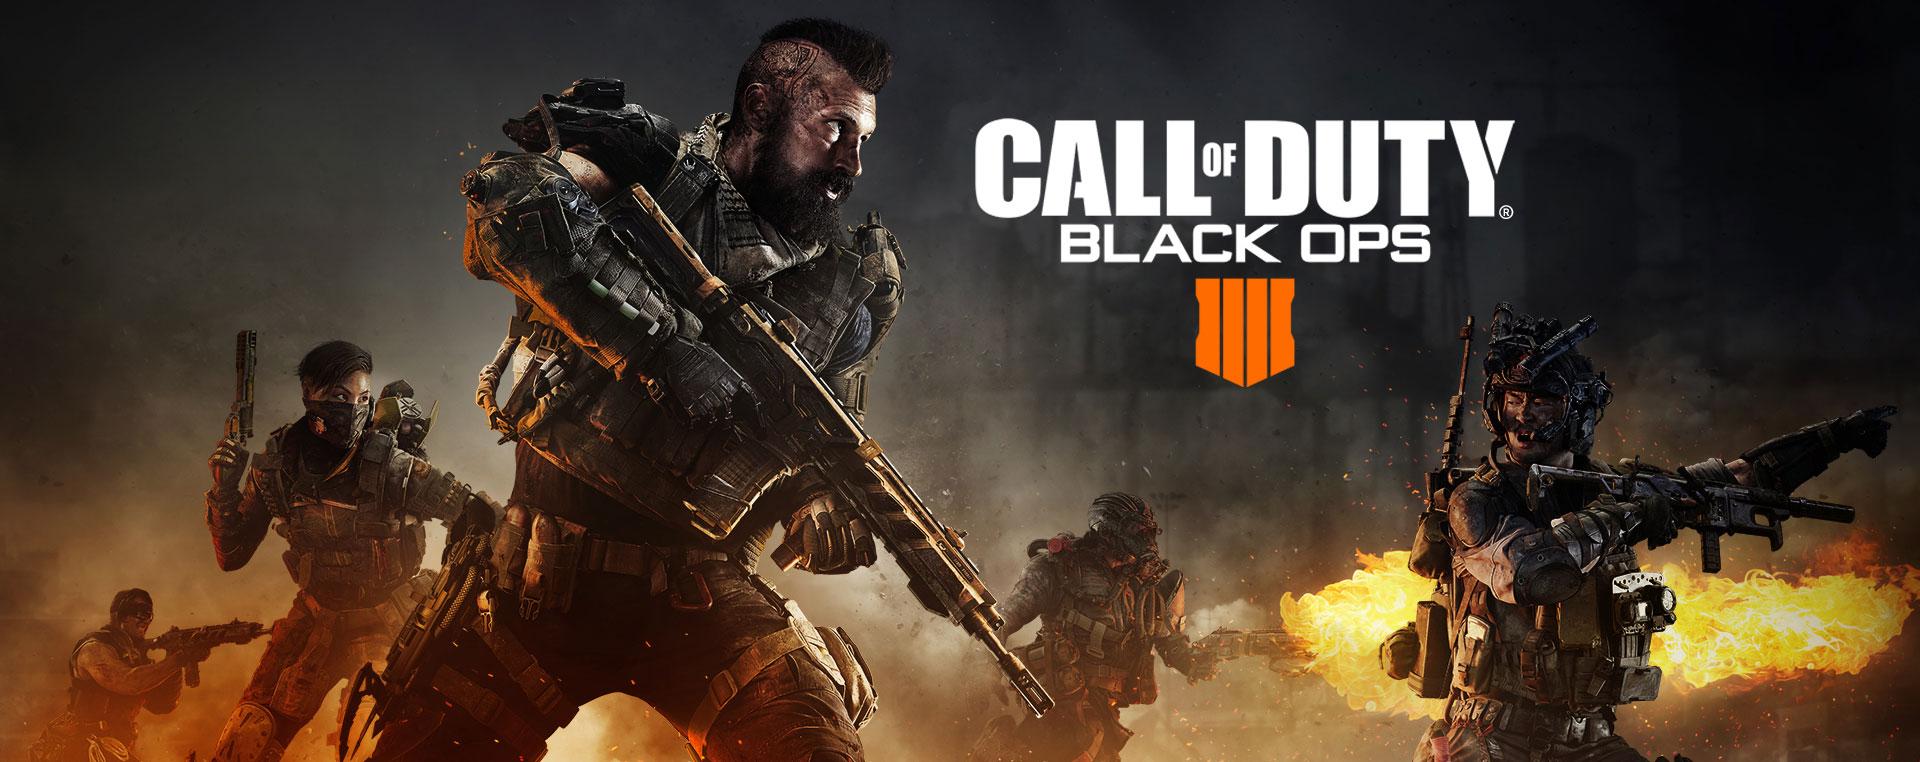 Call Of Duty Black Ops 4 requisiti minimi di sistema